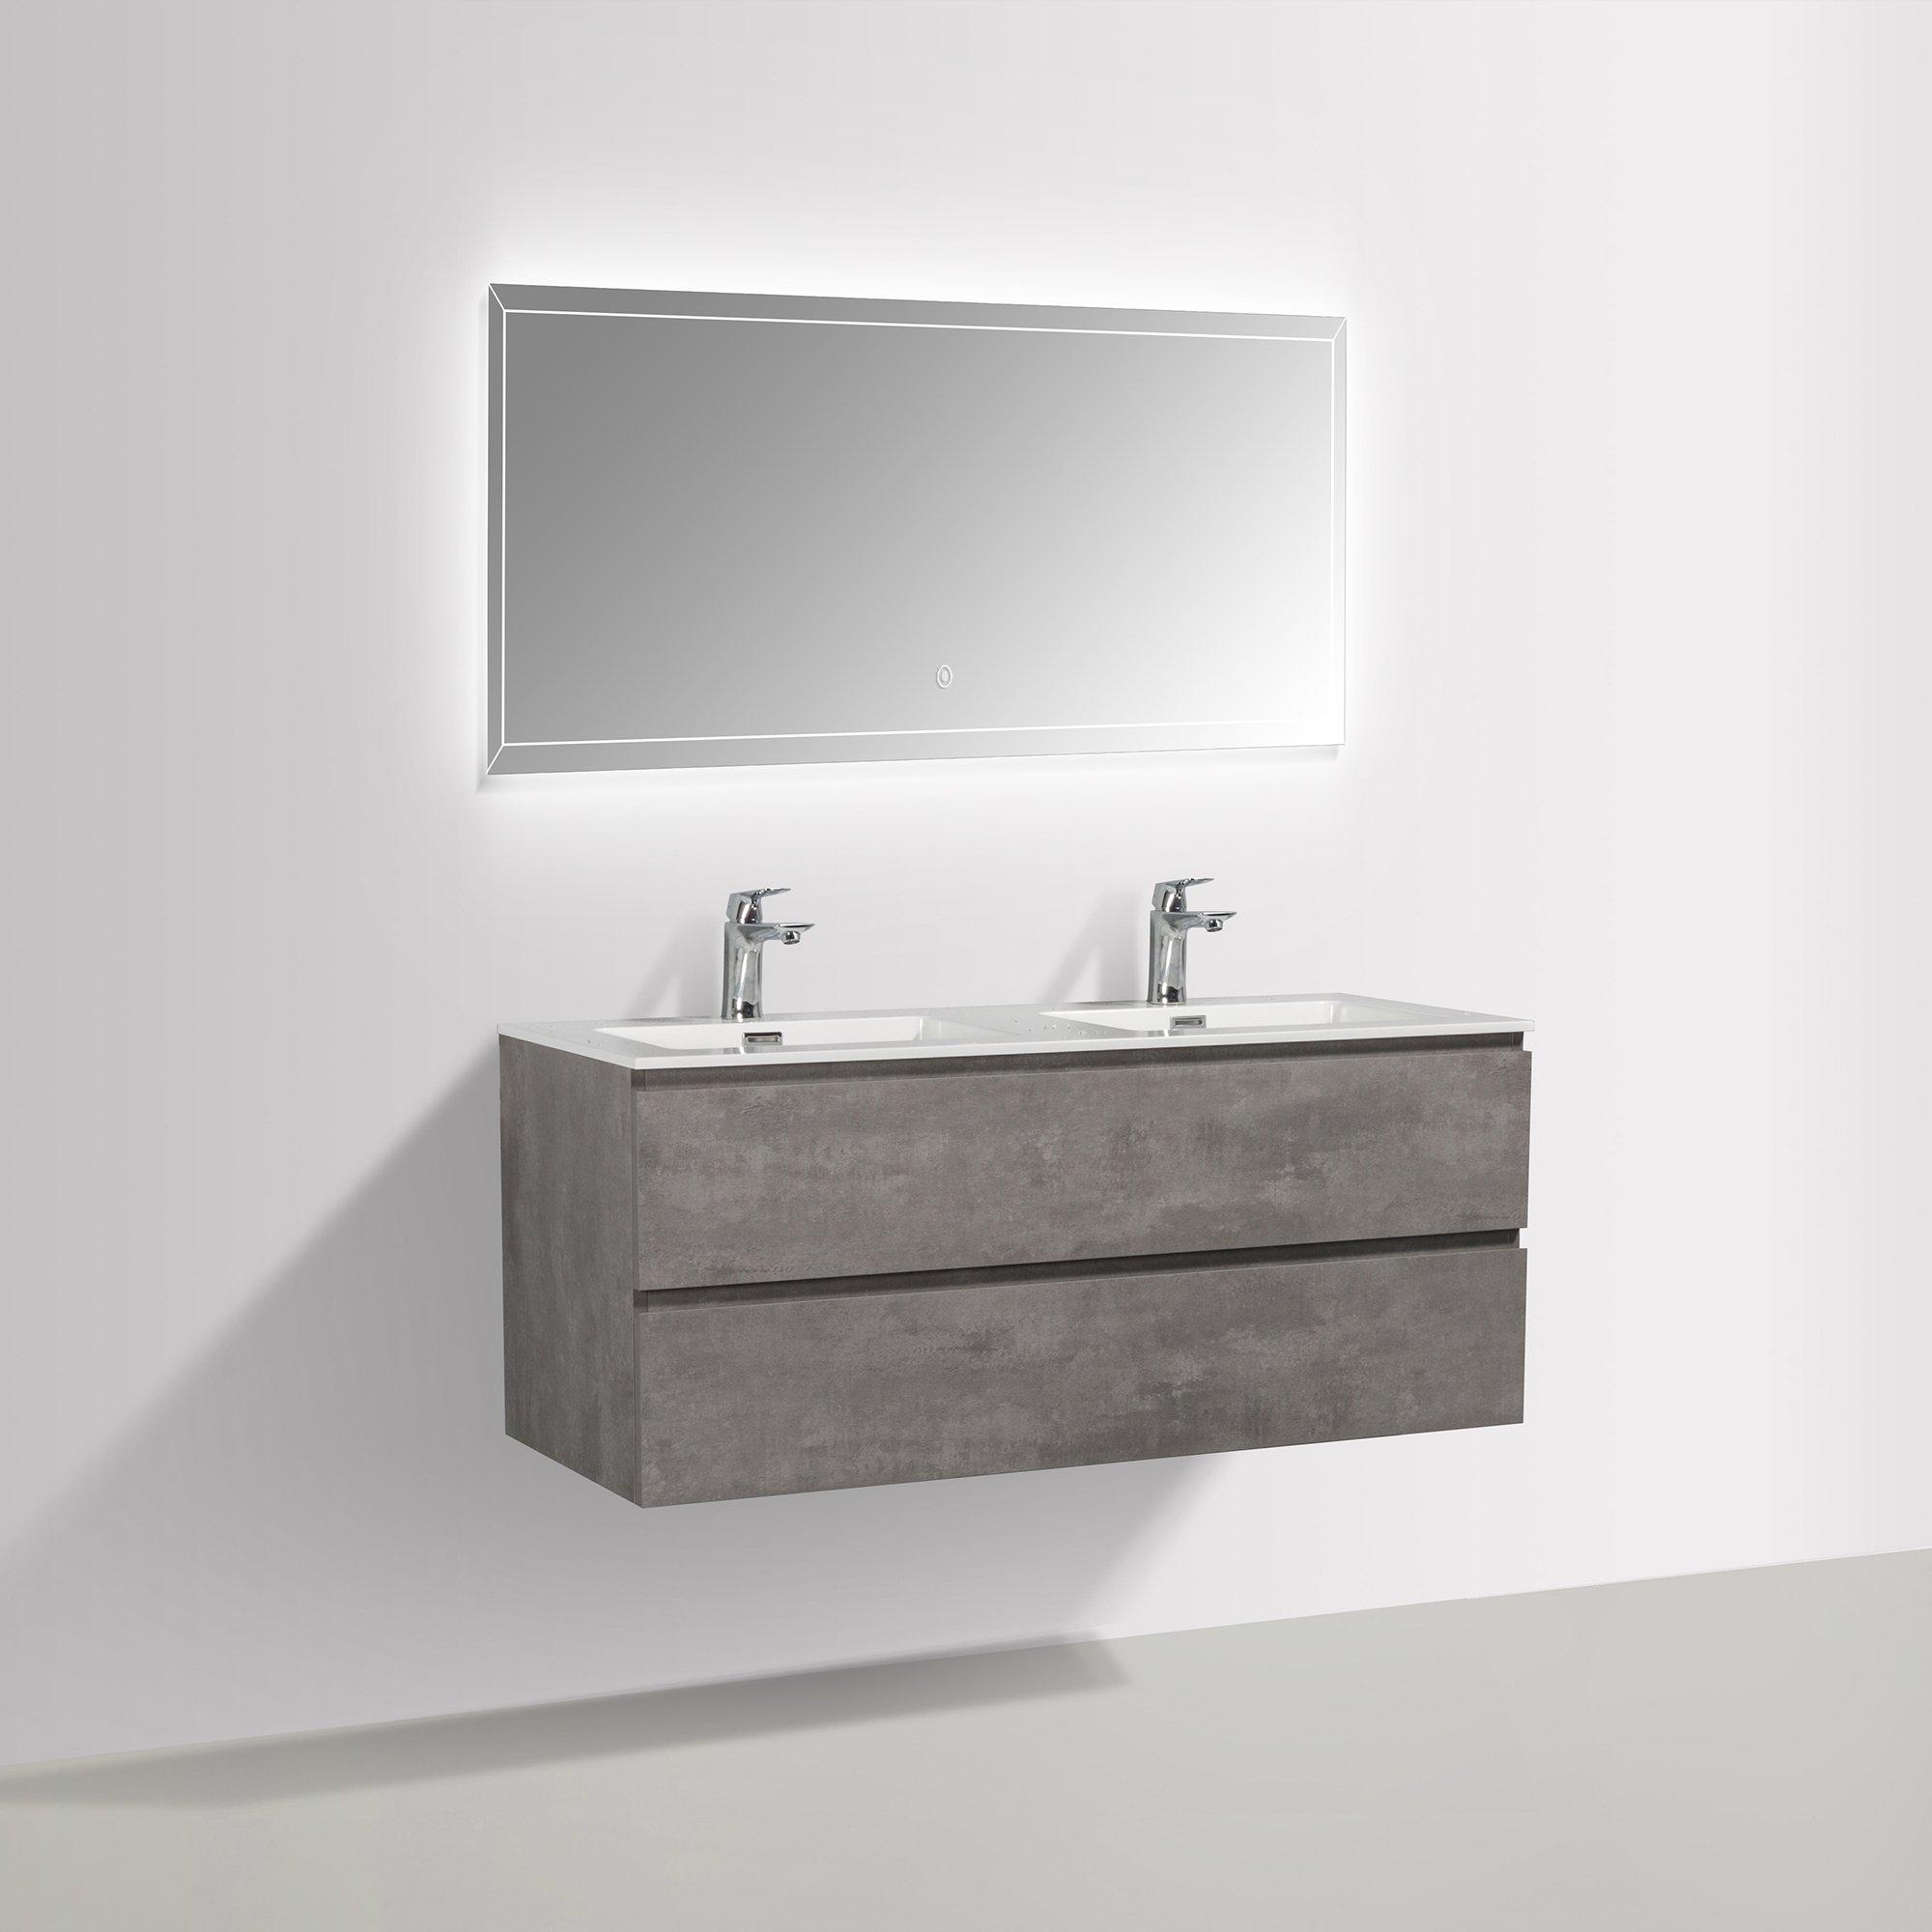 Badmöbel-Set Alice 1200 Beton-Optik - Spiegel optional